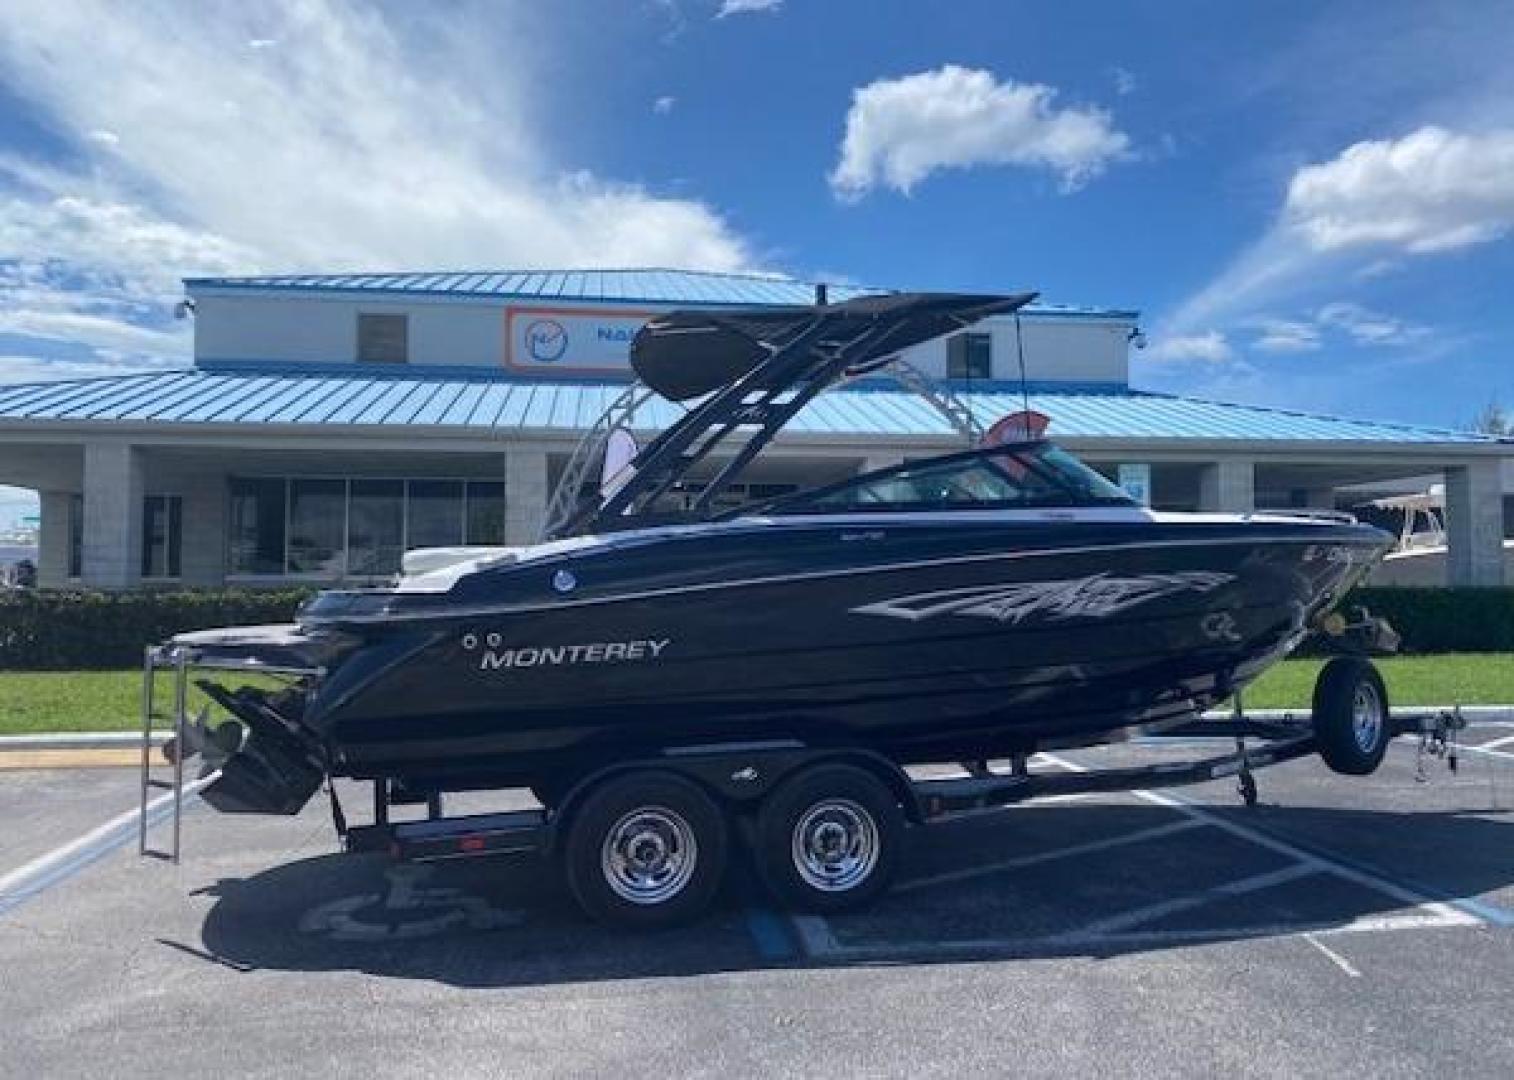 Monterey-224FSX 2017-Monterey 224FSX Tampa Bay-Florida-United States-1530704 | Thumbnail